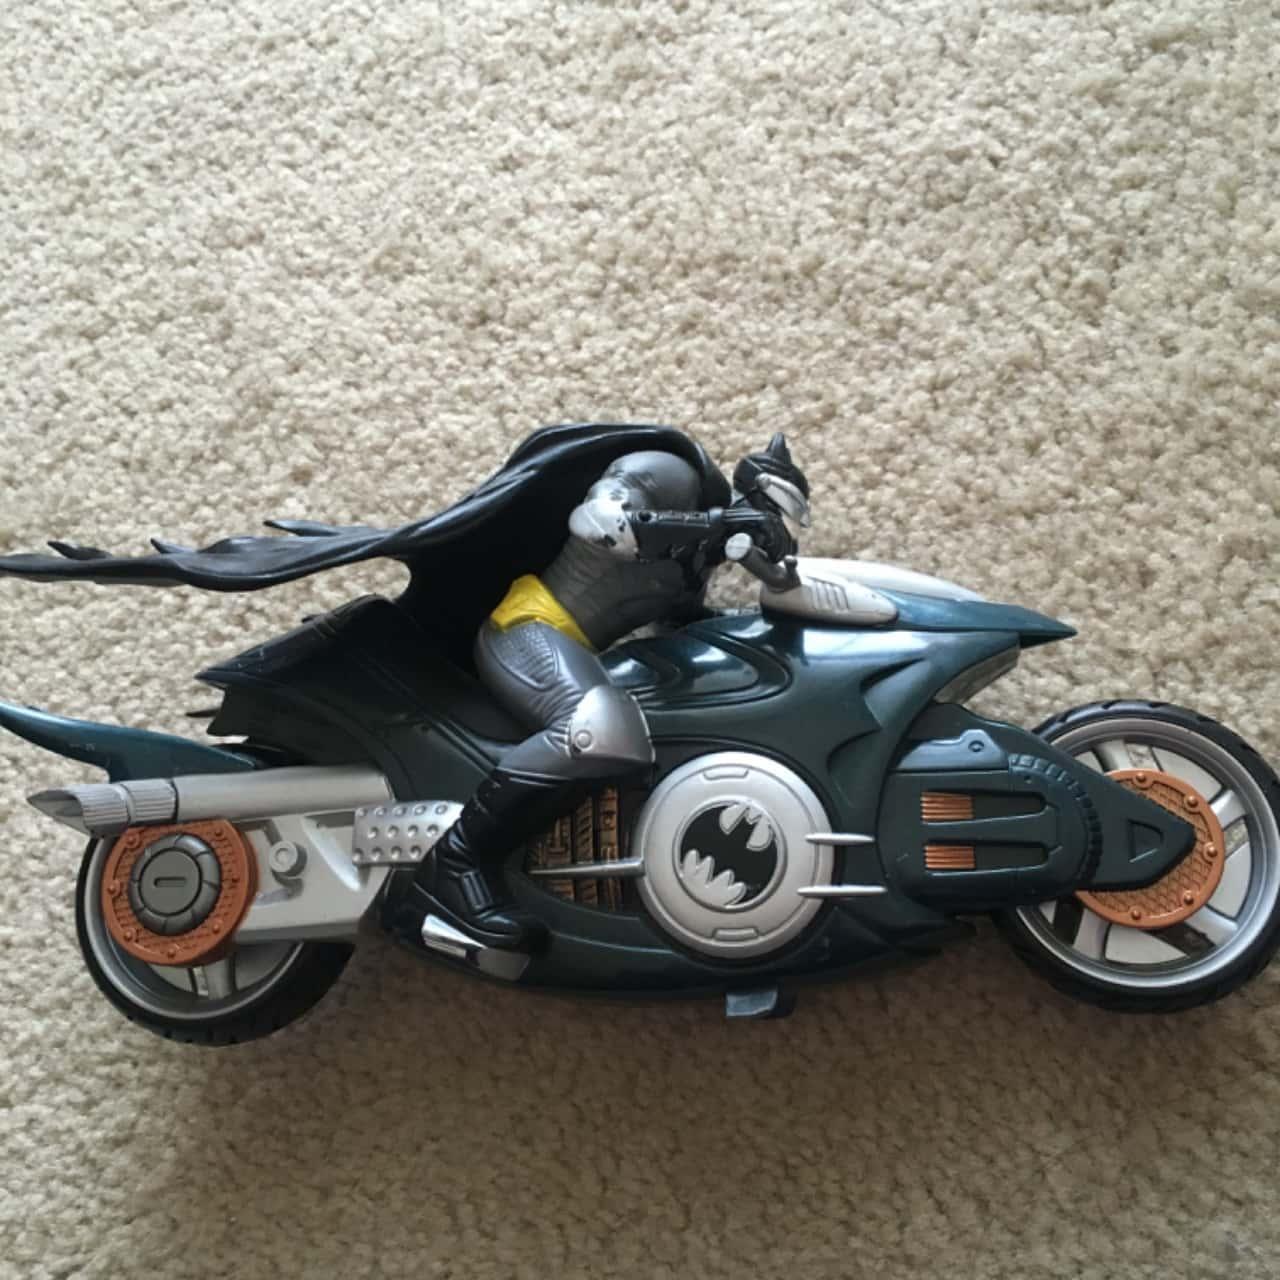 Batman Bat-Bike Figurine - Toy